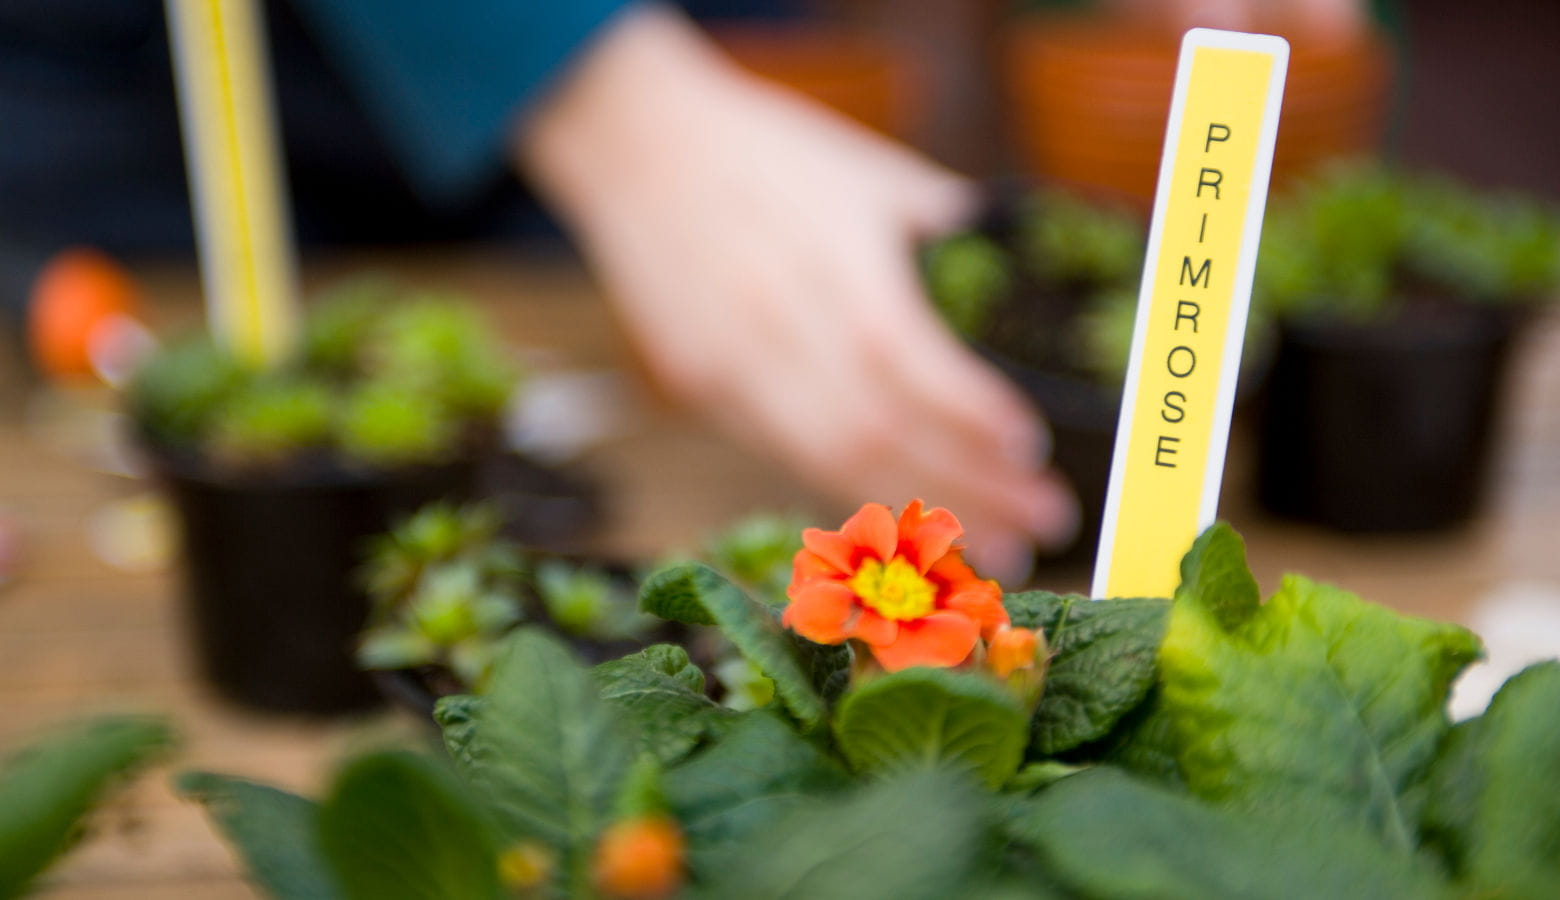 Jardim con etiquetas